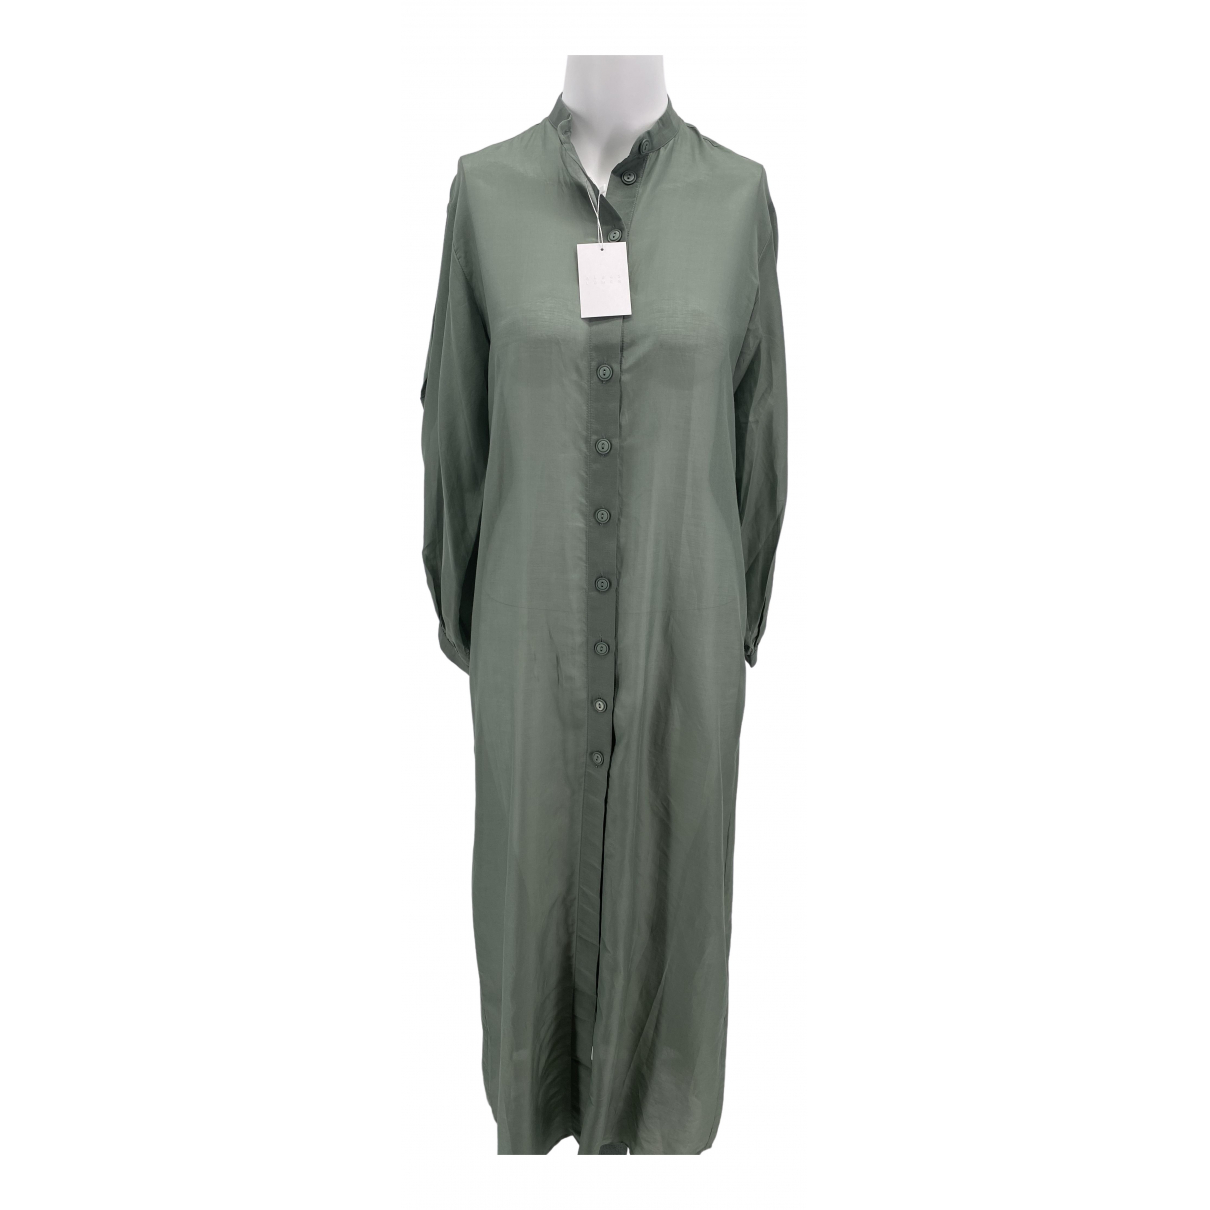 Albus Lumen \N Khaki Silk dress for Women XS International